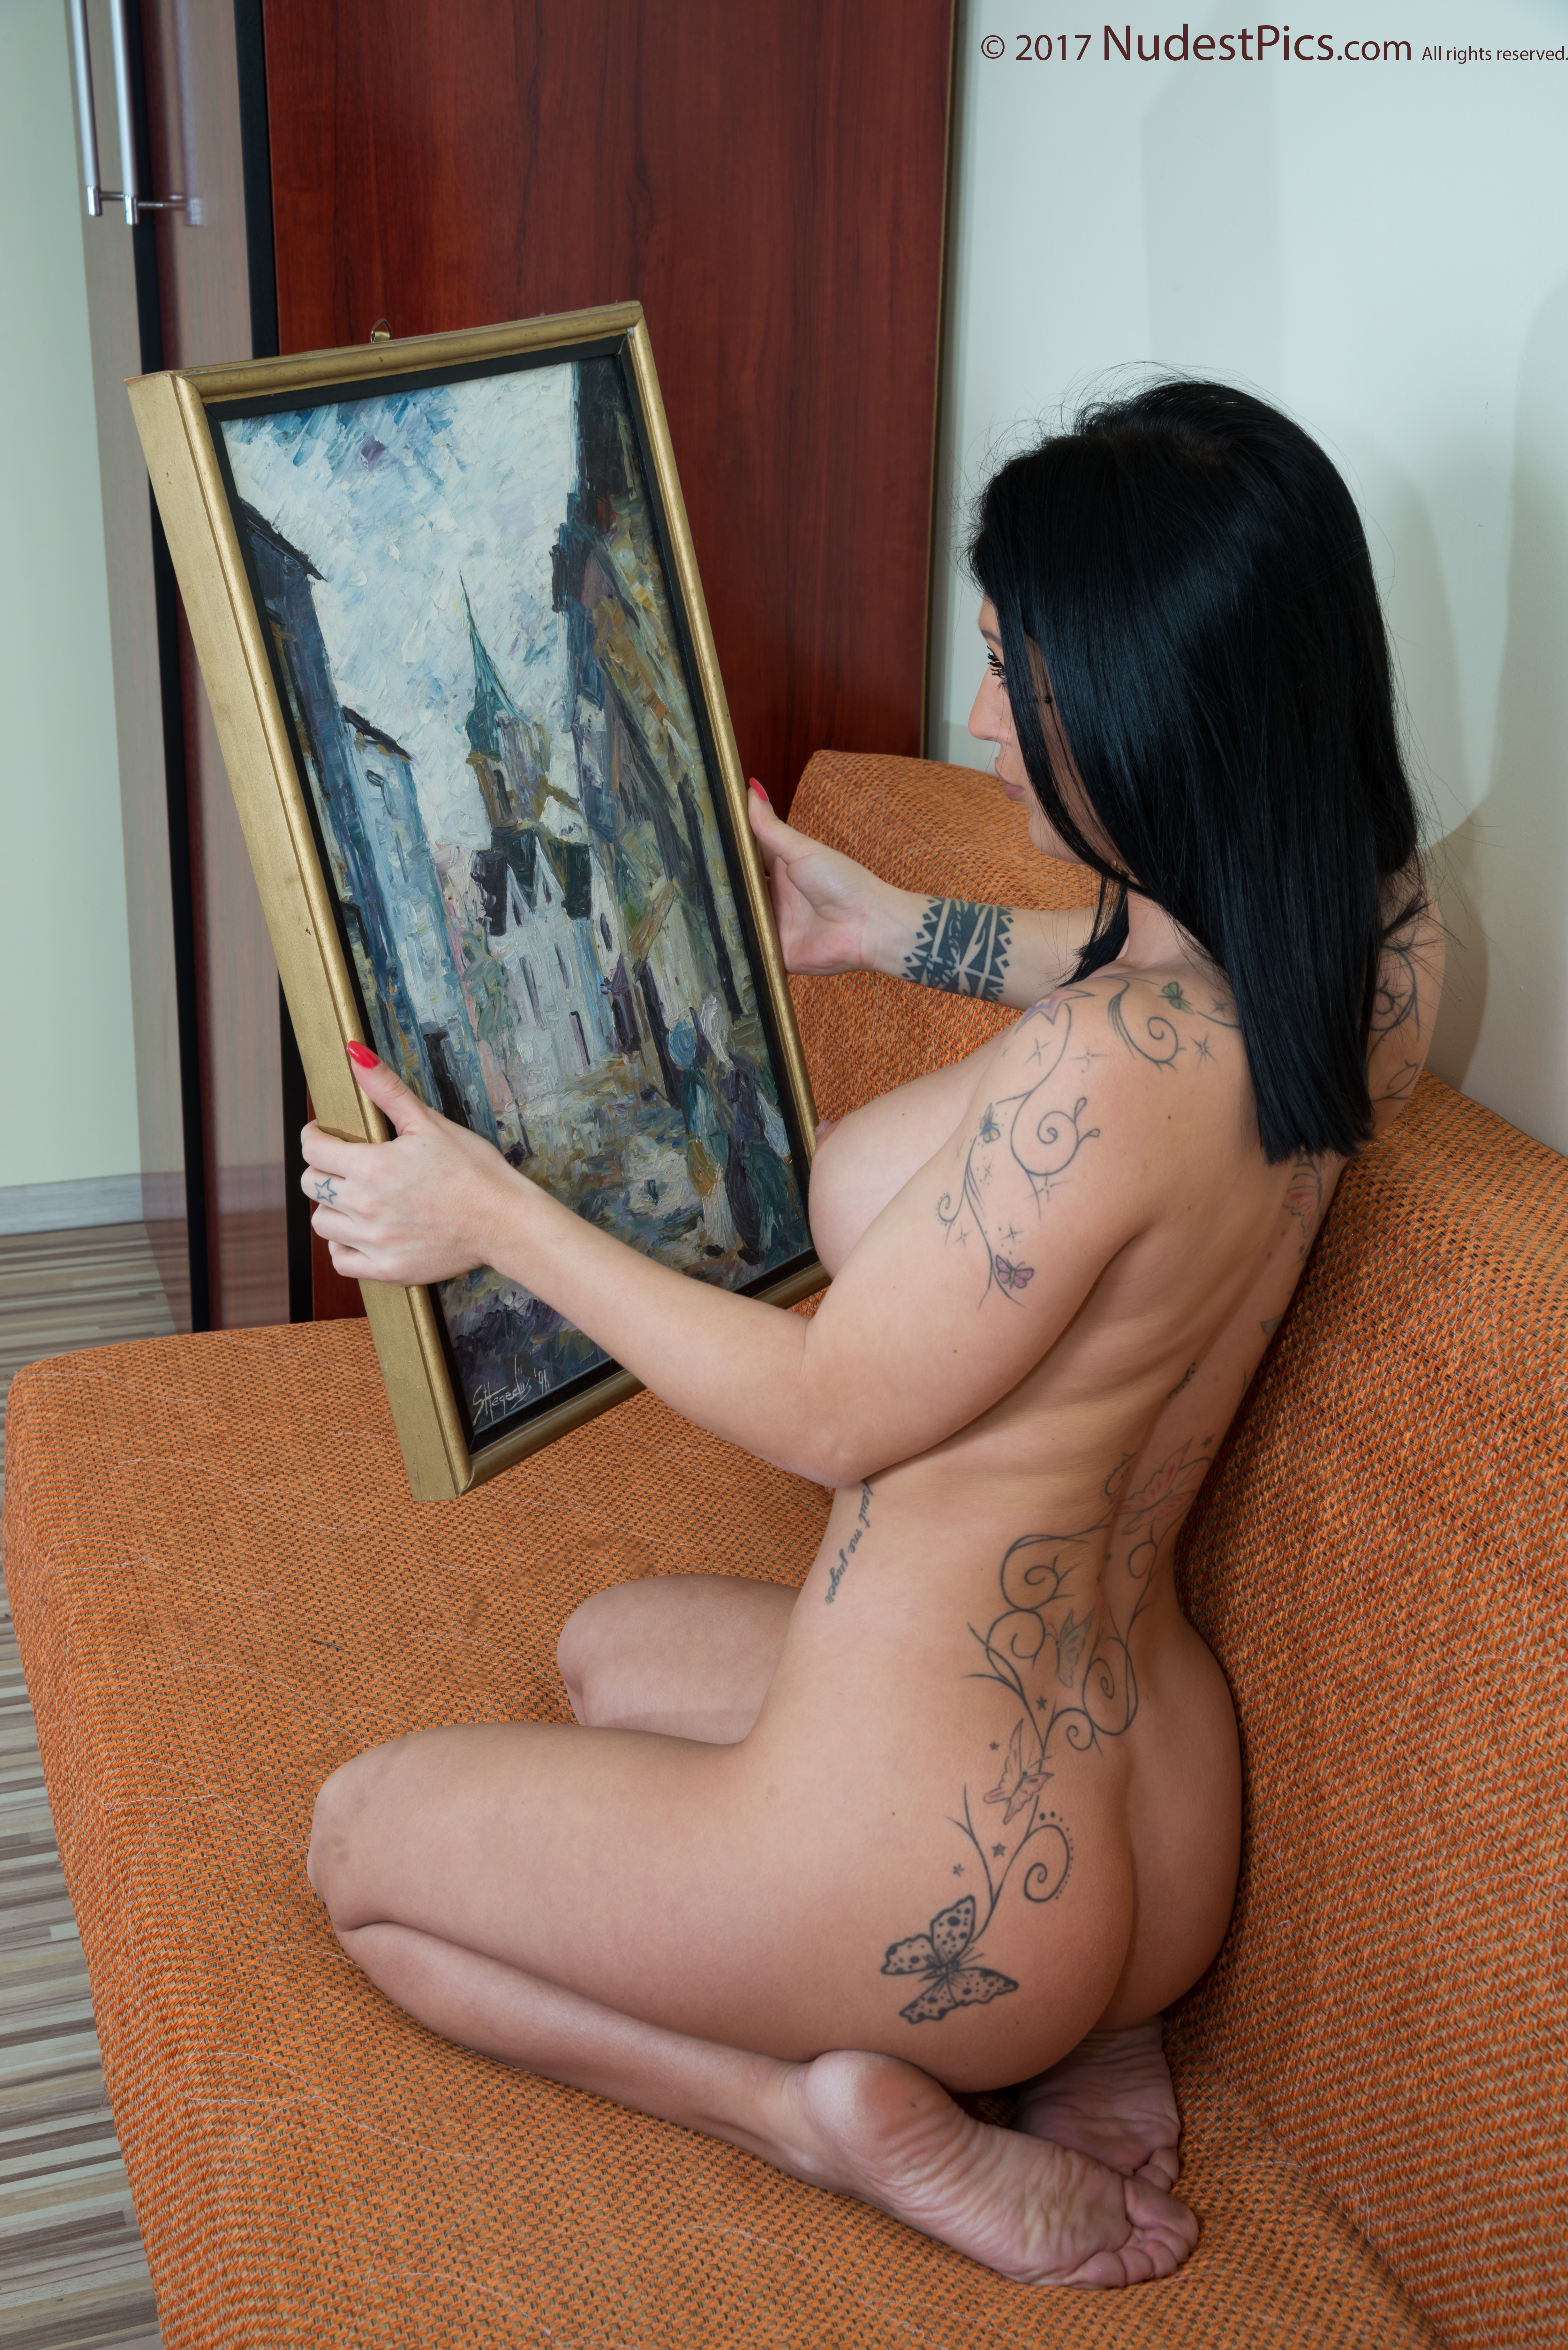 Naked Tattooed Hot Girl Admiring Art painting